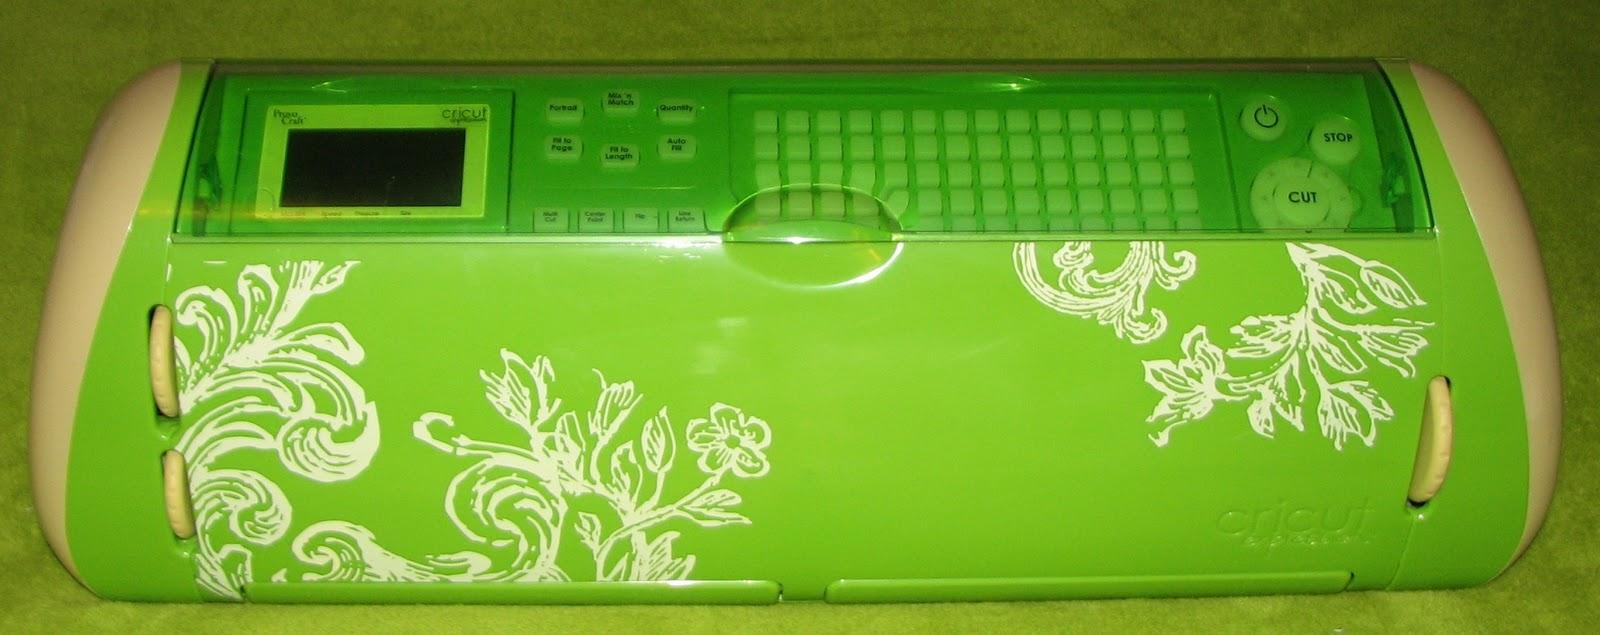 Green Cricut